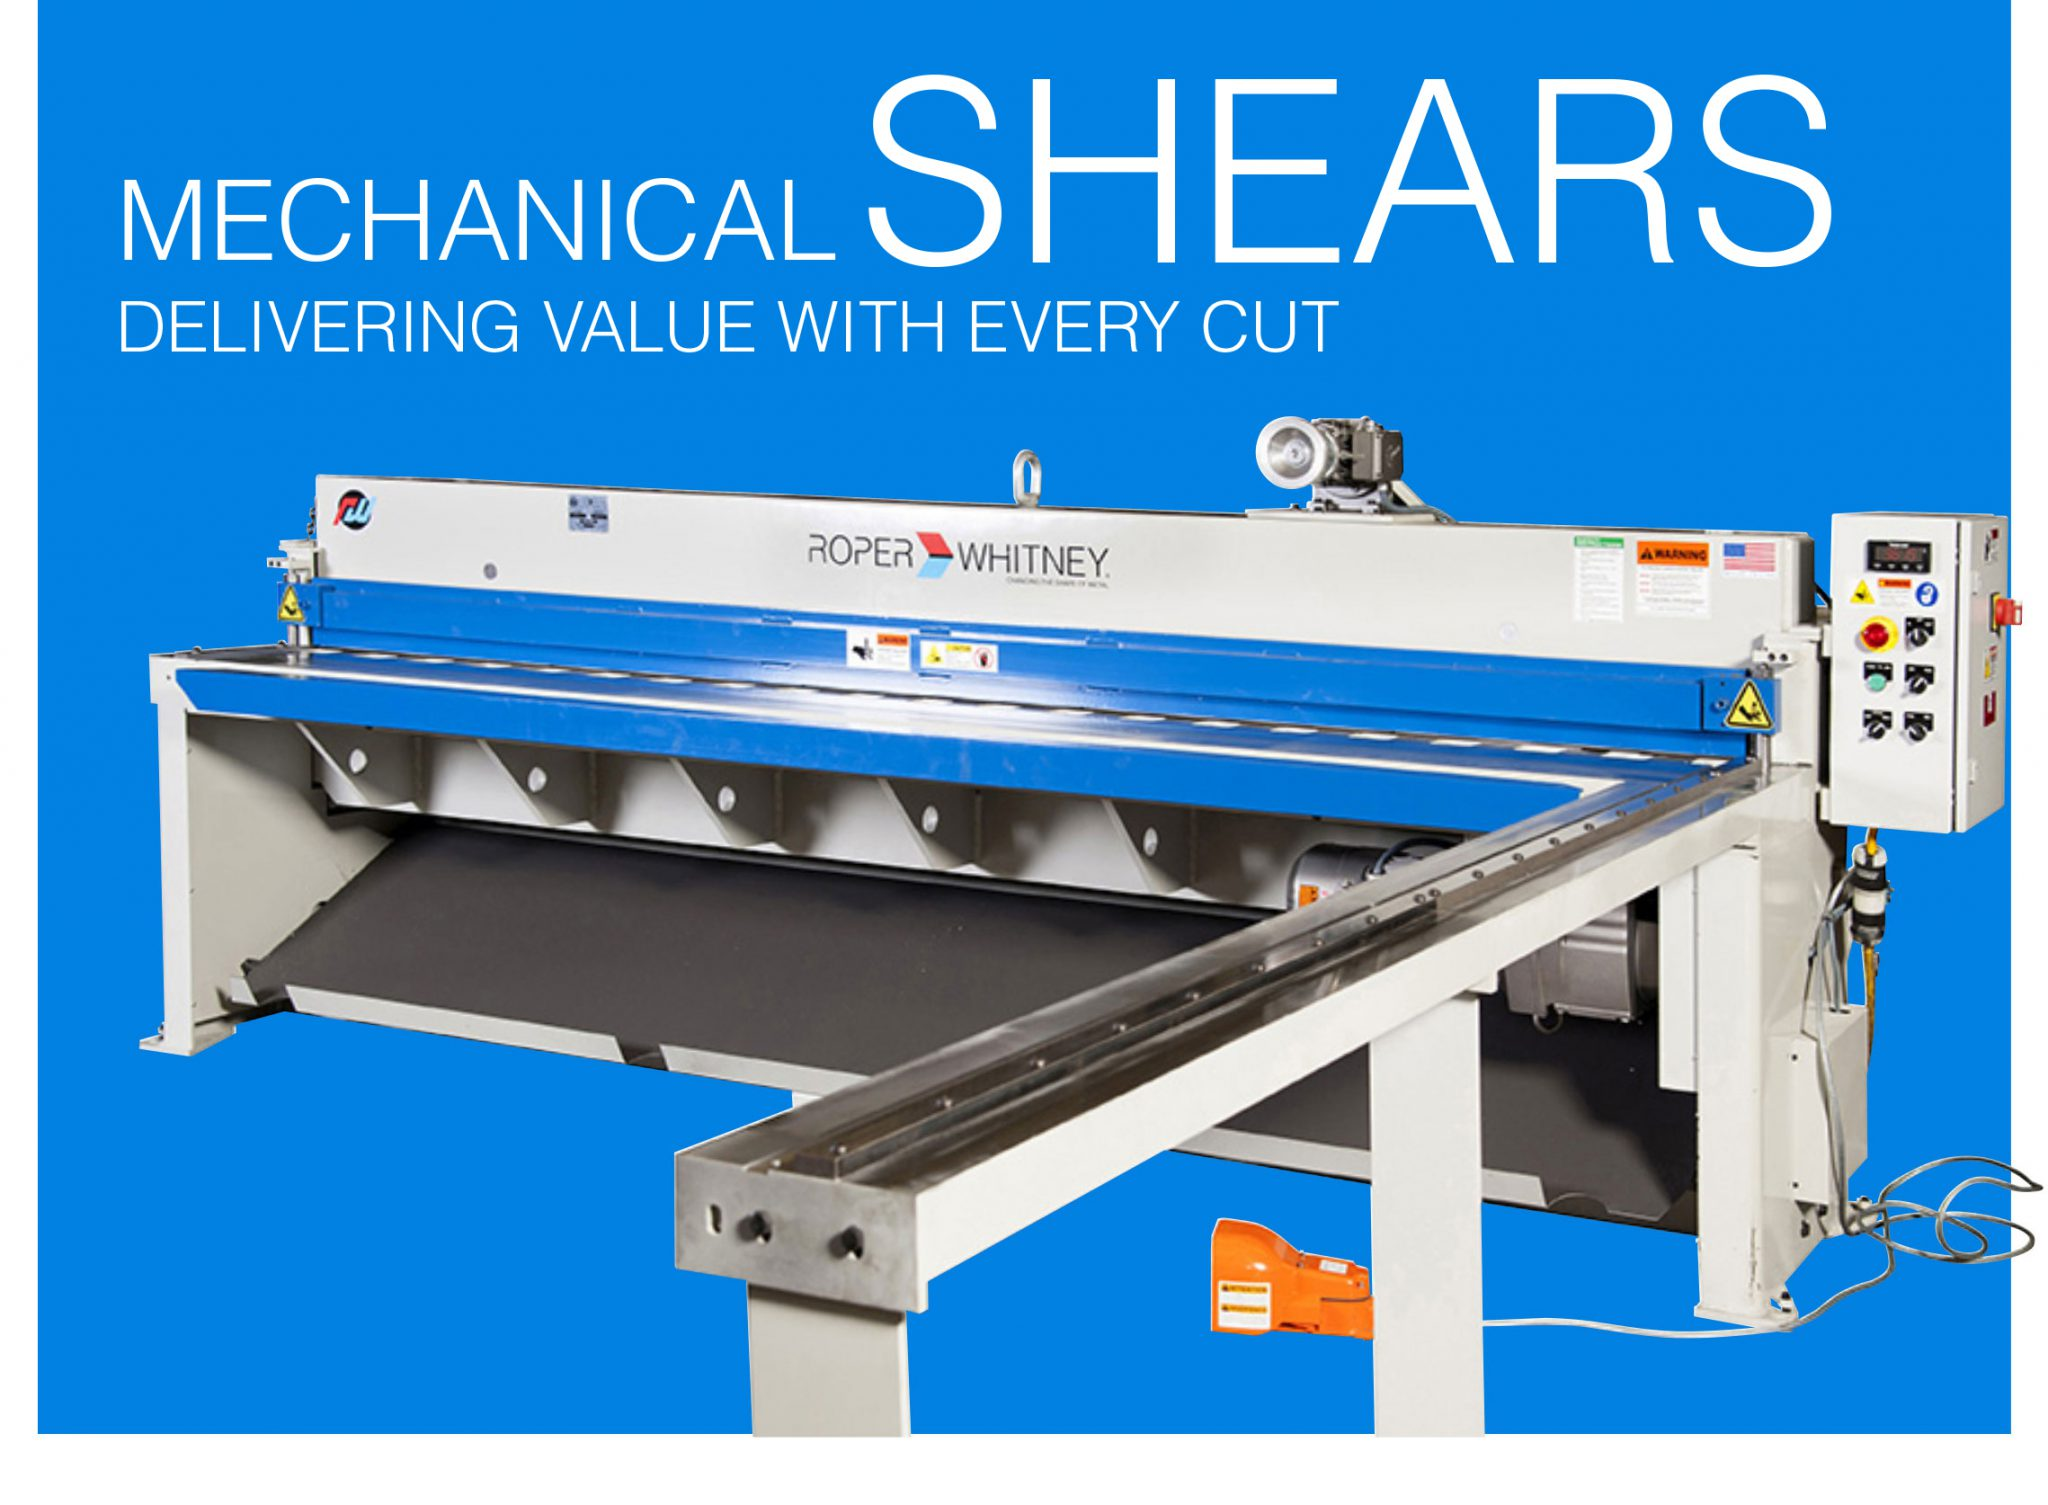 Mechanical Sheet Metal Shears by Roper Whitney